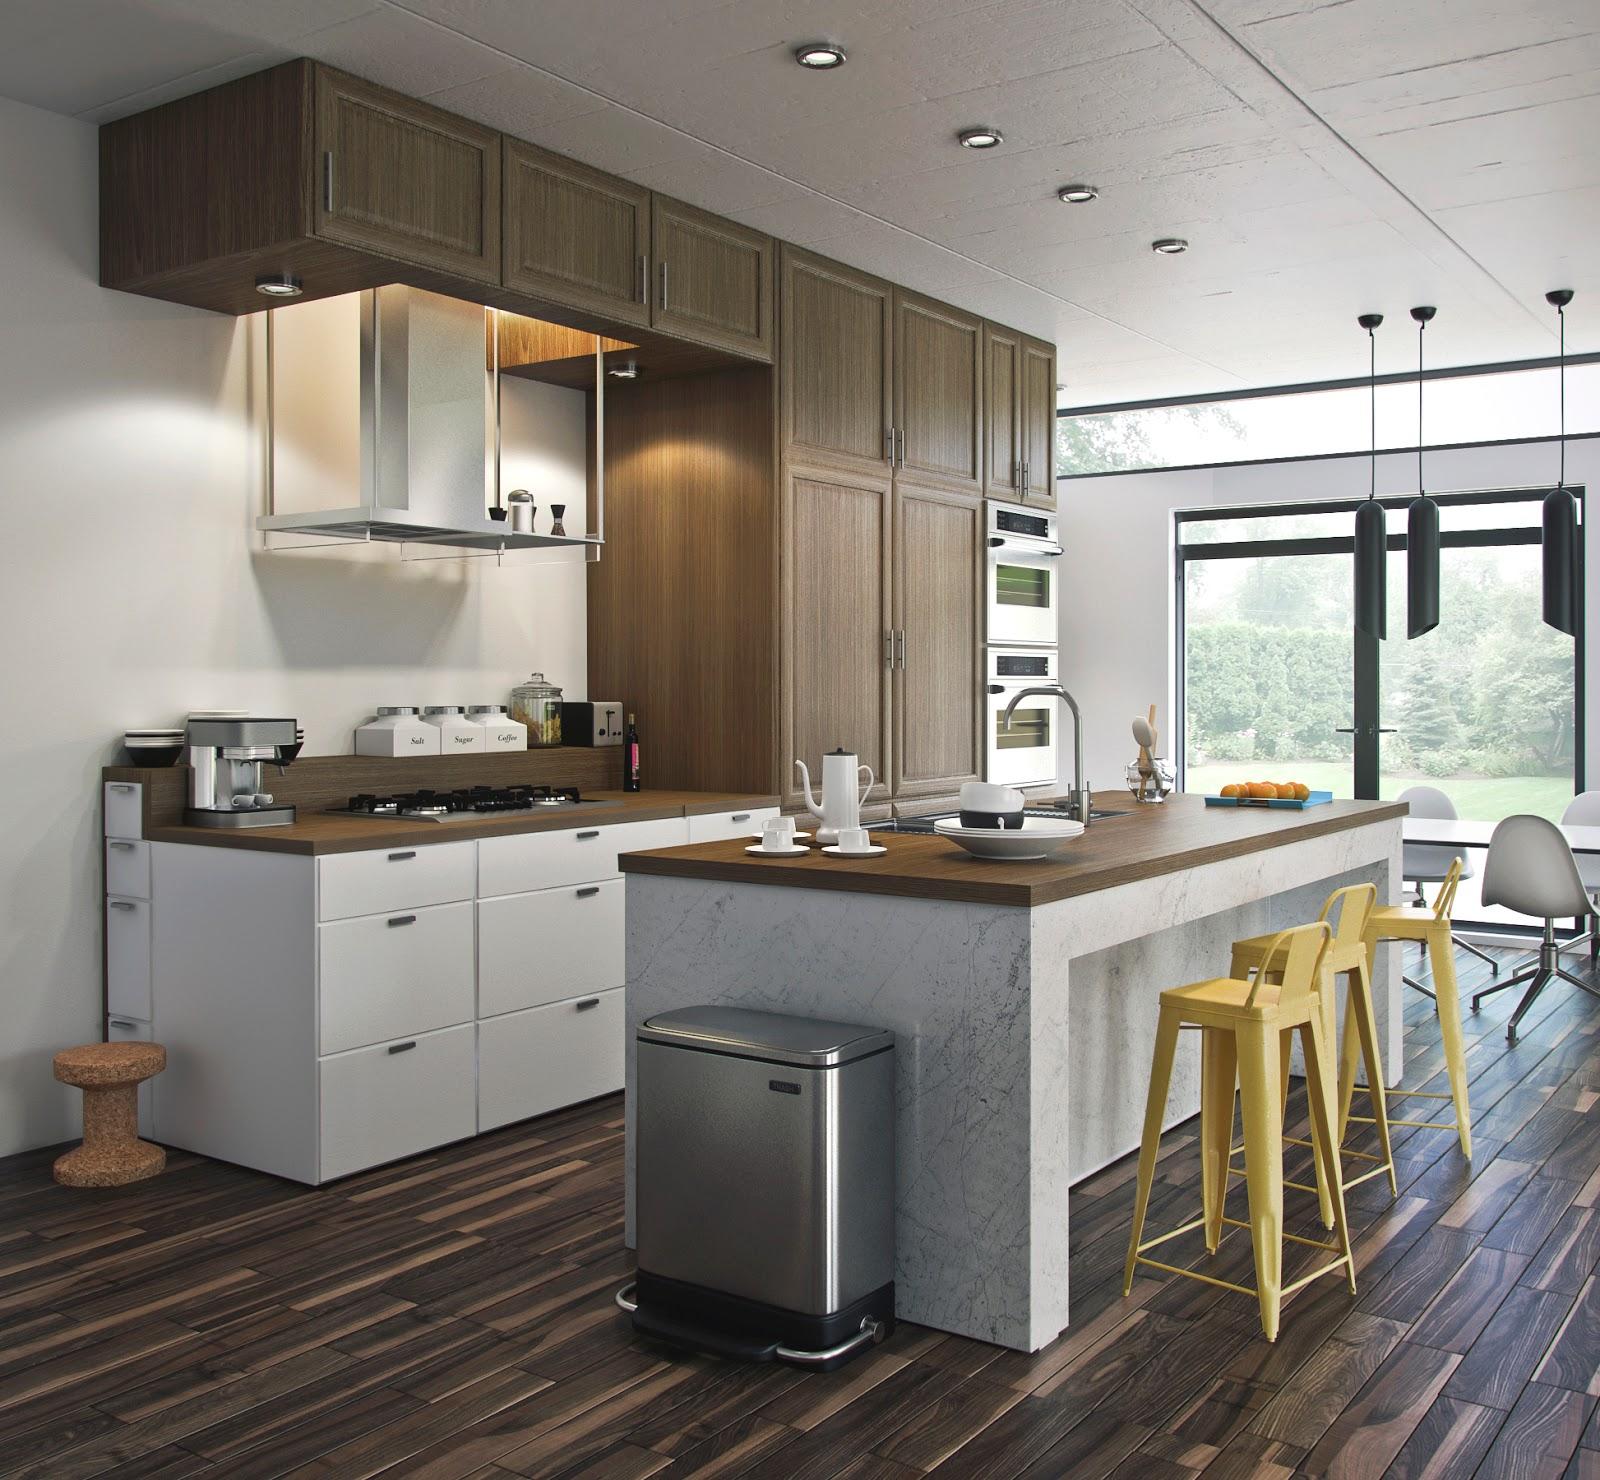 Vray Kitchen Modeling